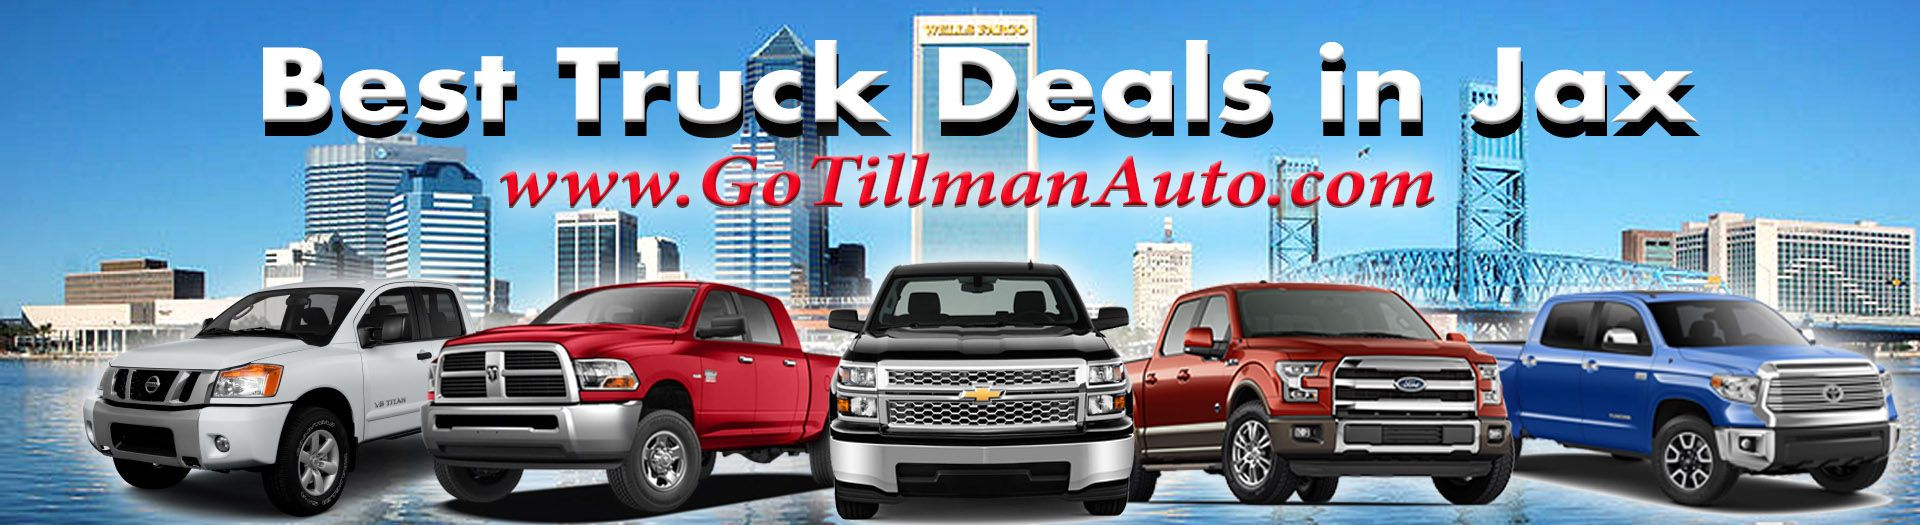 Car Dealerships Jacksonville Fl_2503 Used car reviews